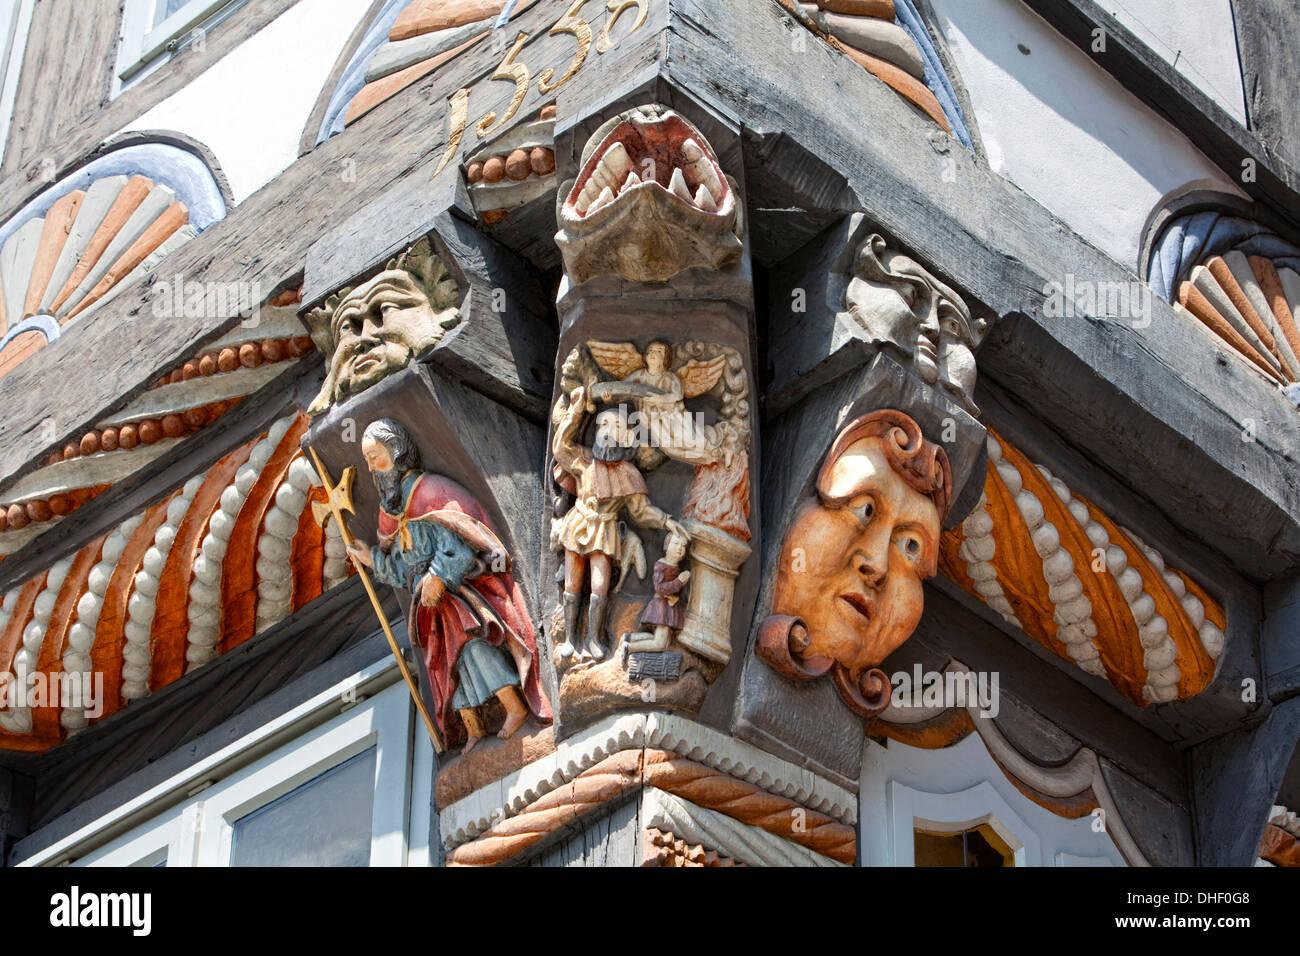 Enlace de Isaac , elaboradamente tallada detalle arquitectónico de Stiftsherrenhaus, 1558, Osterstrasse, Hameln, Baja Sajonia, Alemania Imagen De Stock